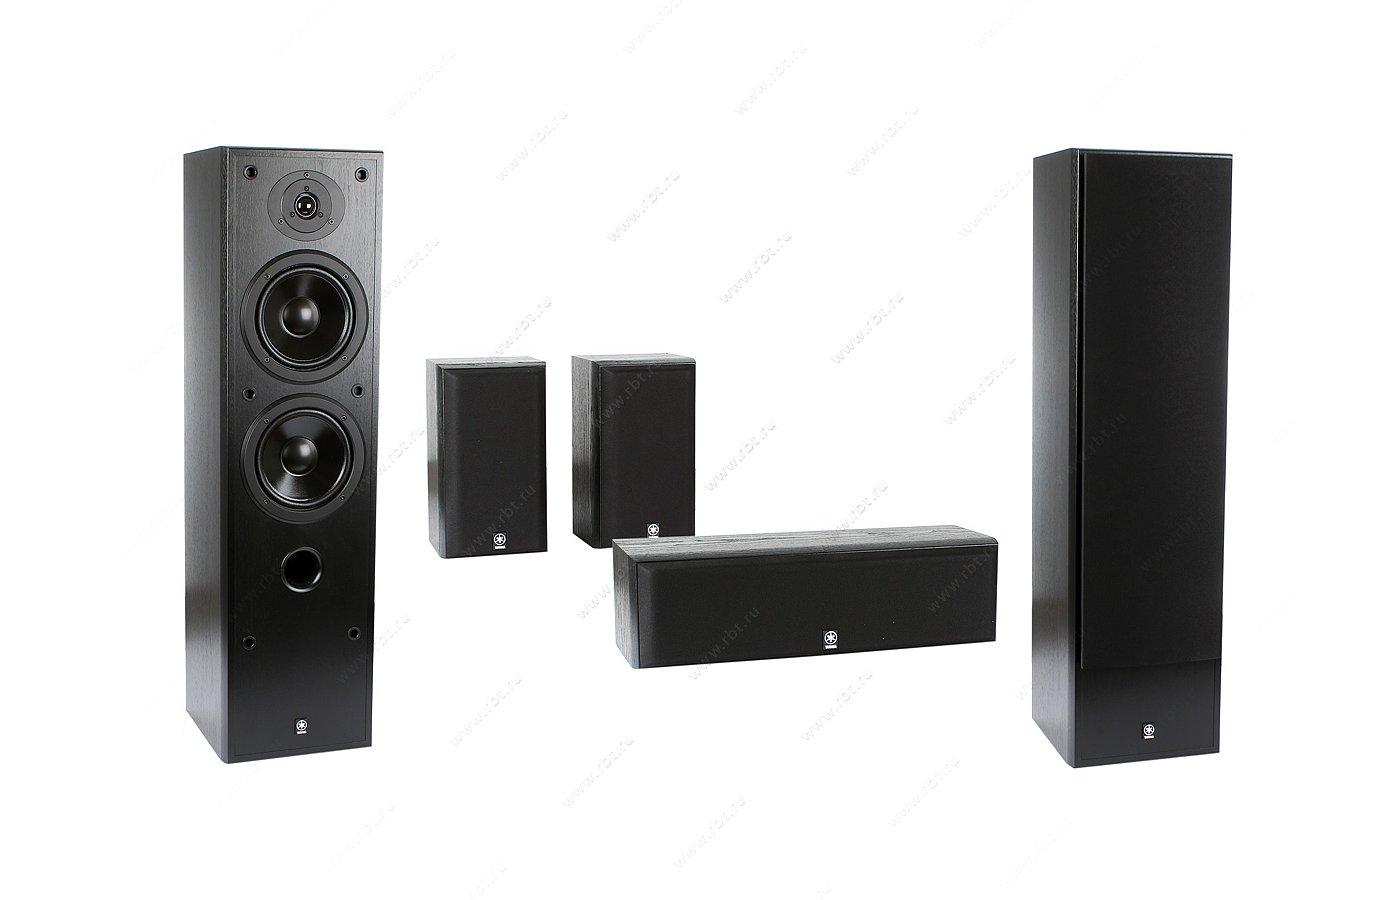 Комплект акустики YAMAHA NS-50F Black+NS-P60 Black (5.0 комплект)